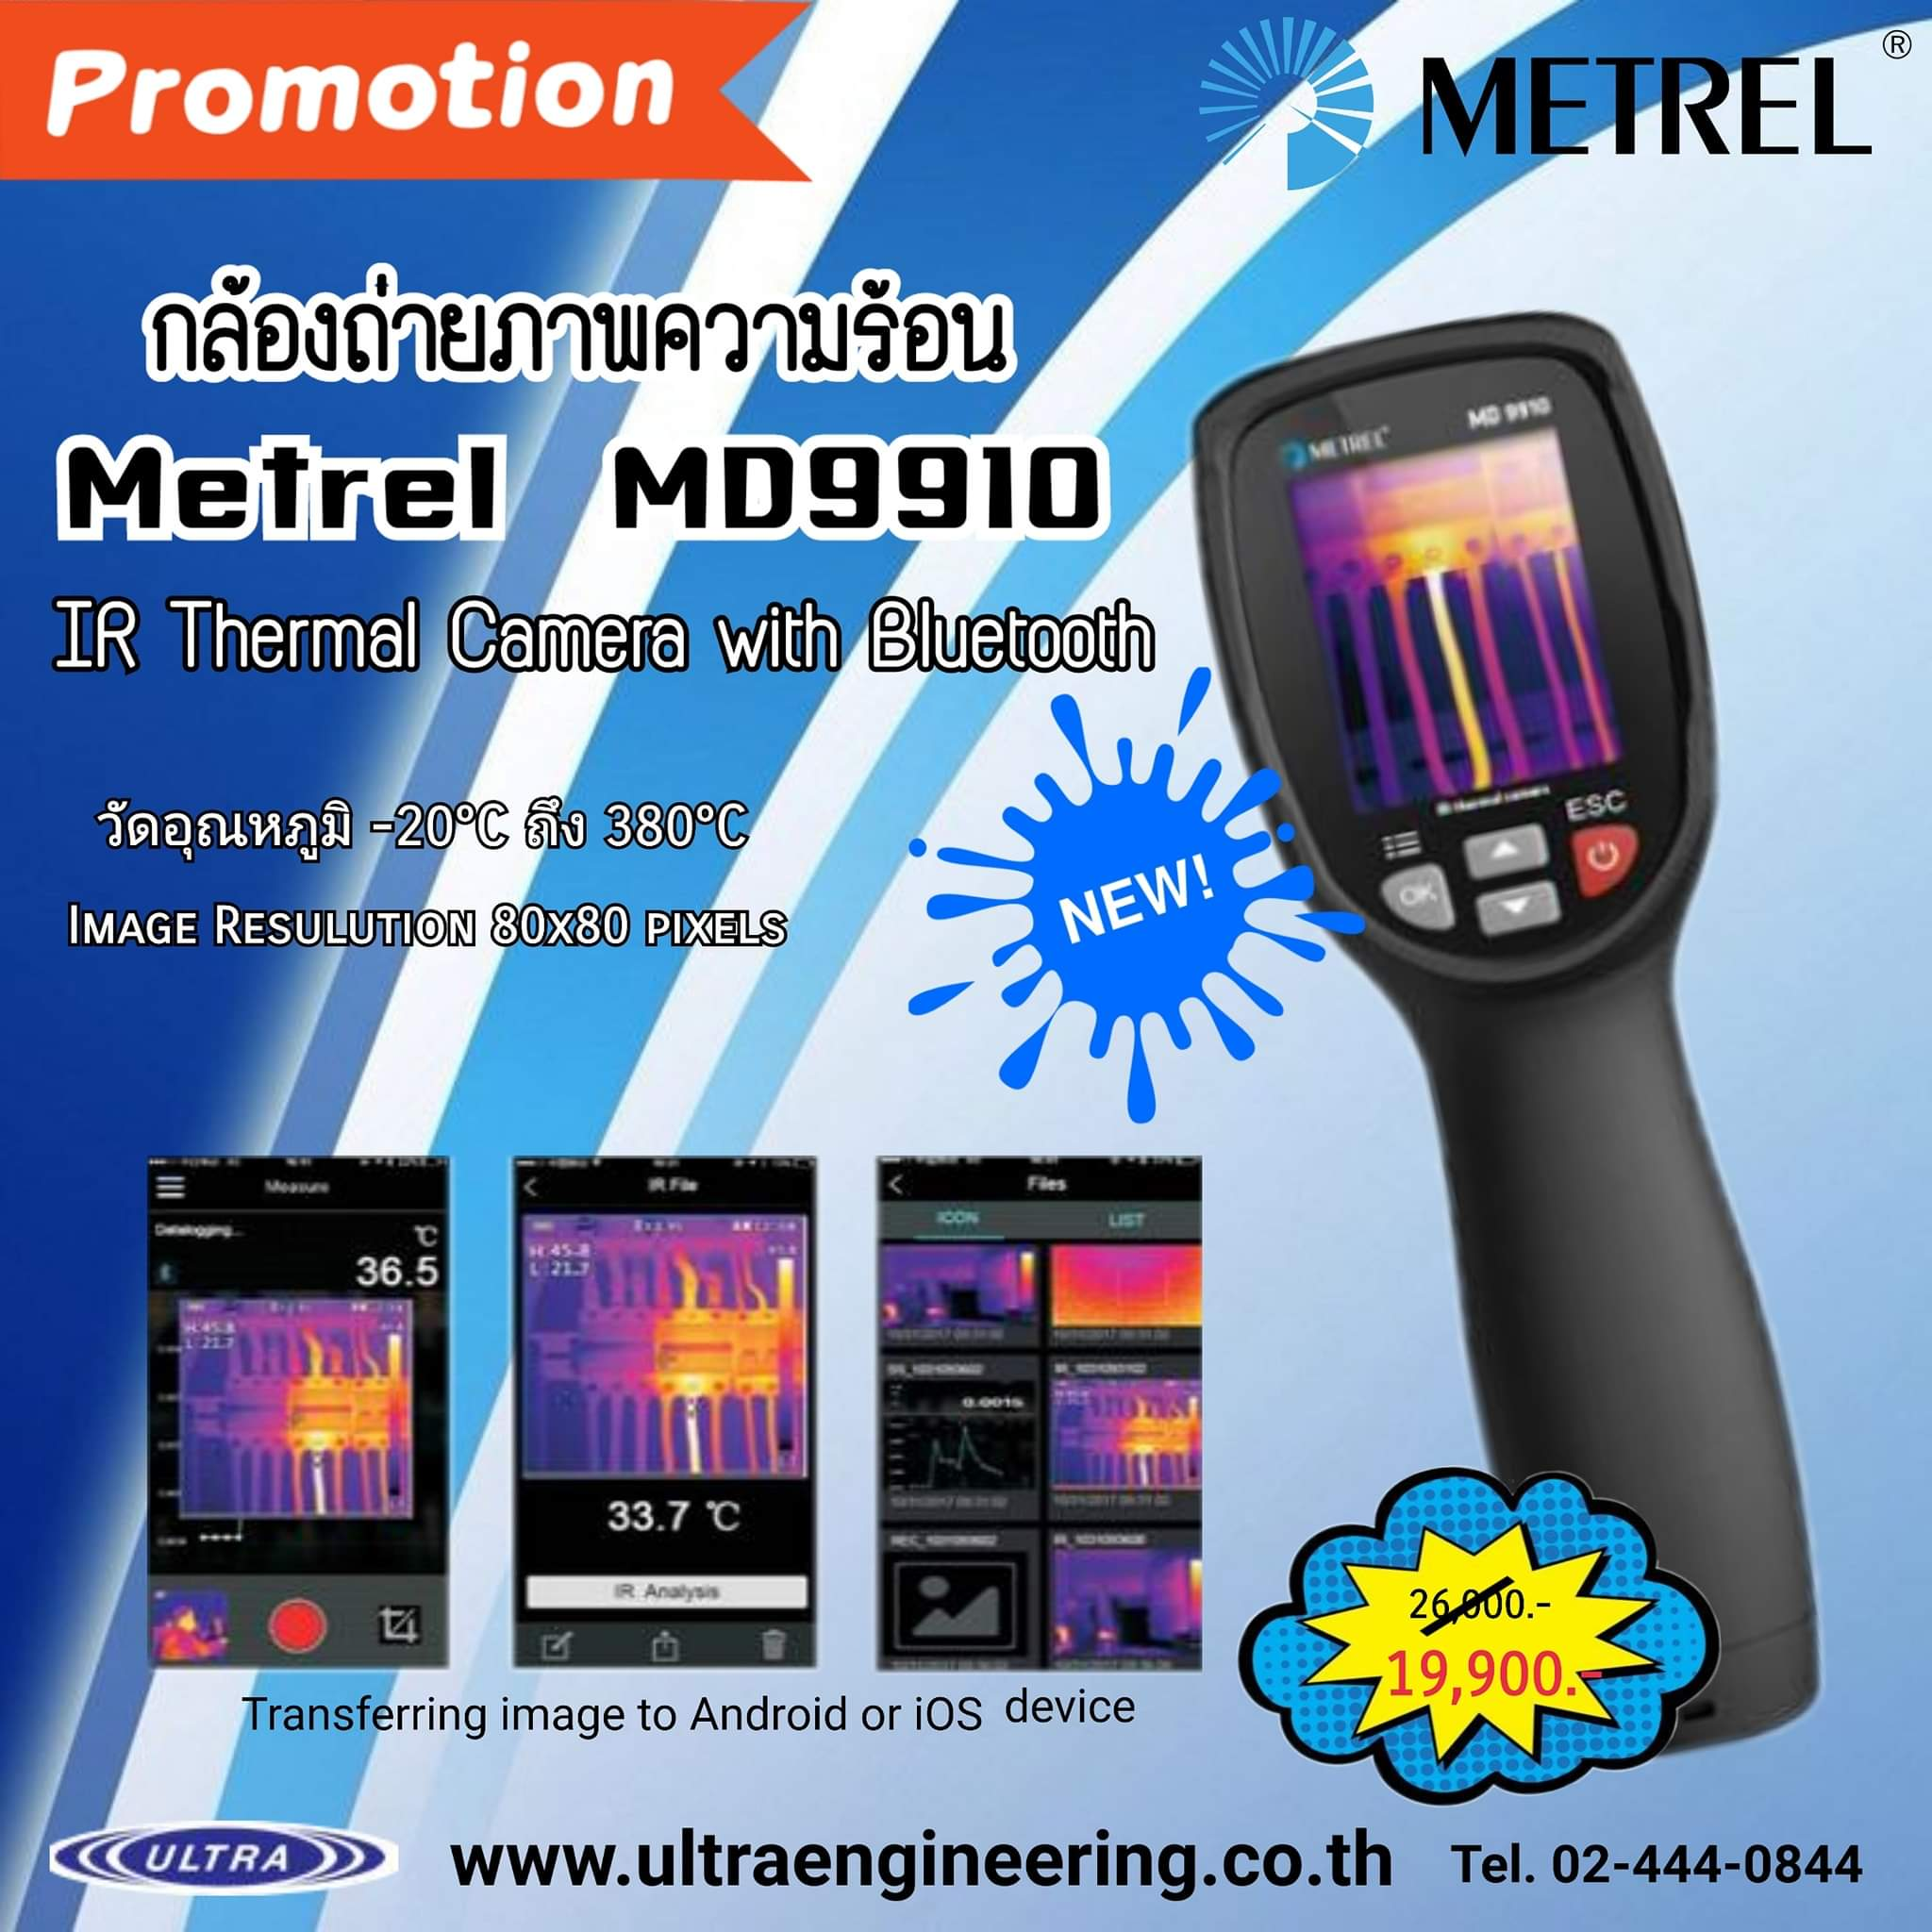 Metrel MD 9910 Thermal camera มาตรฐานยุโรป ราคาประหยัด